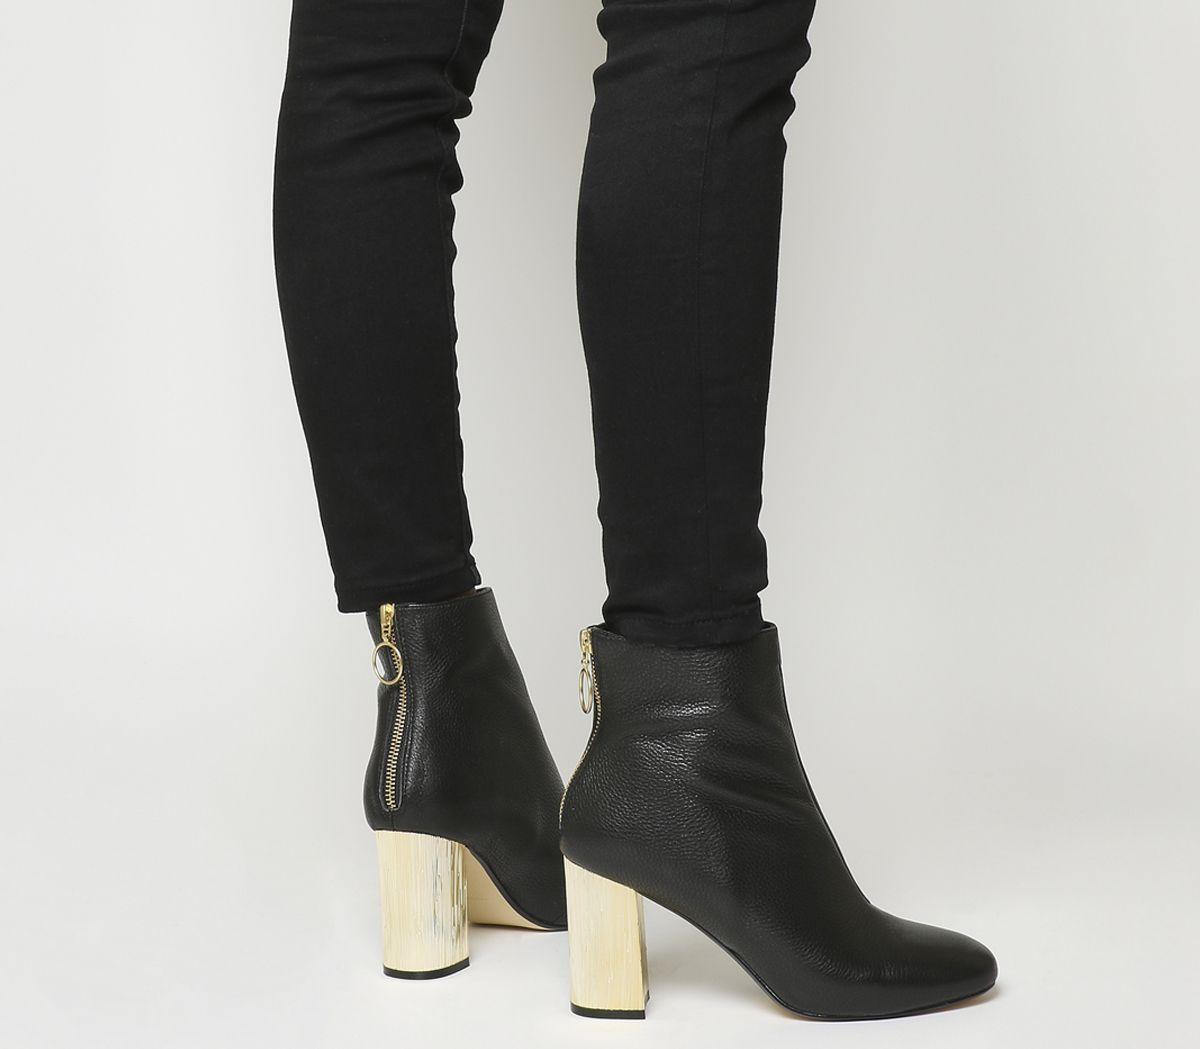 191ffe13d5f Office Alaska Block Heel Ankle Boots Black Leather Gold Heel - Ankle ...